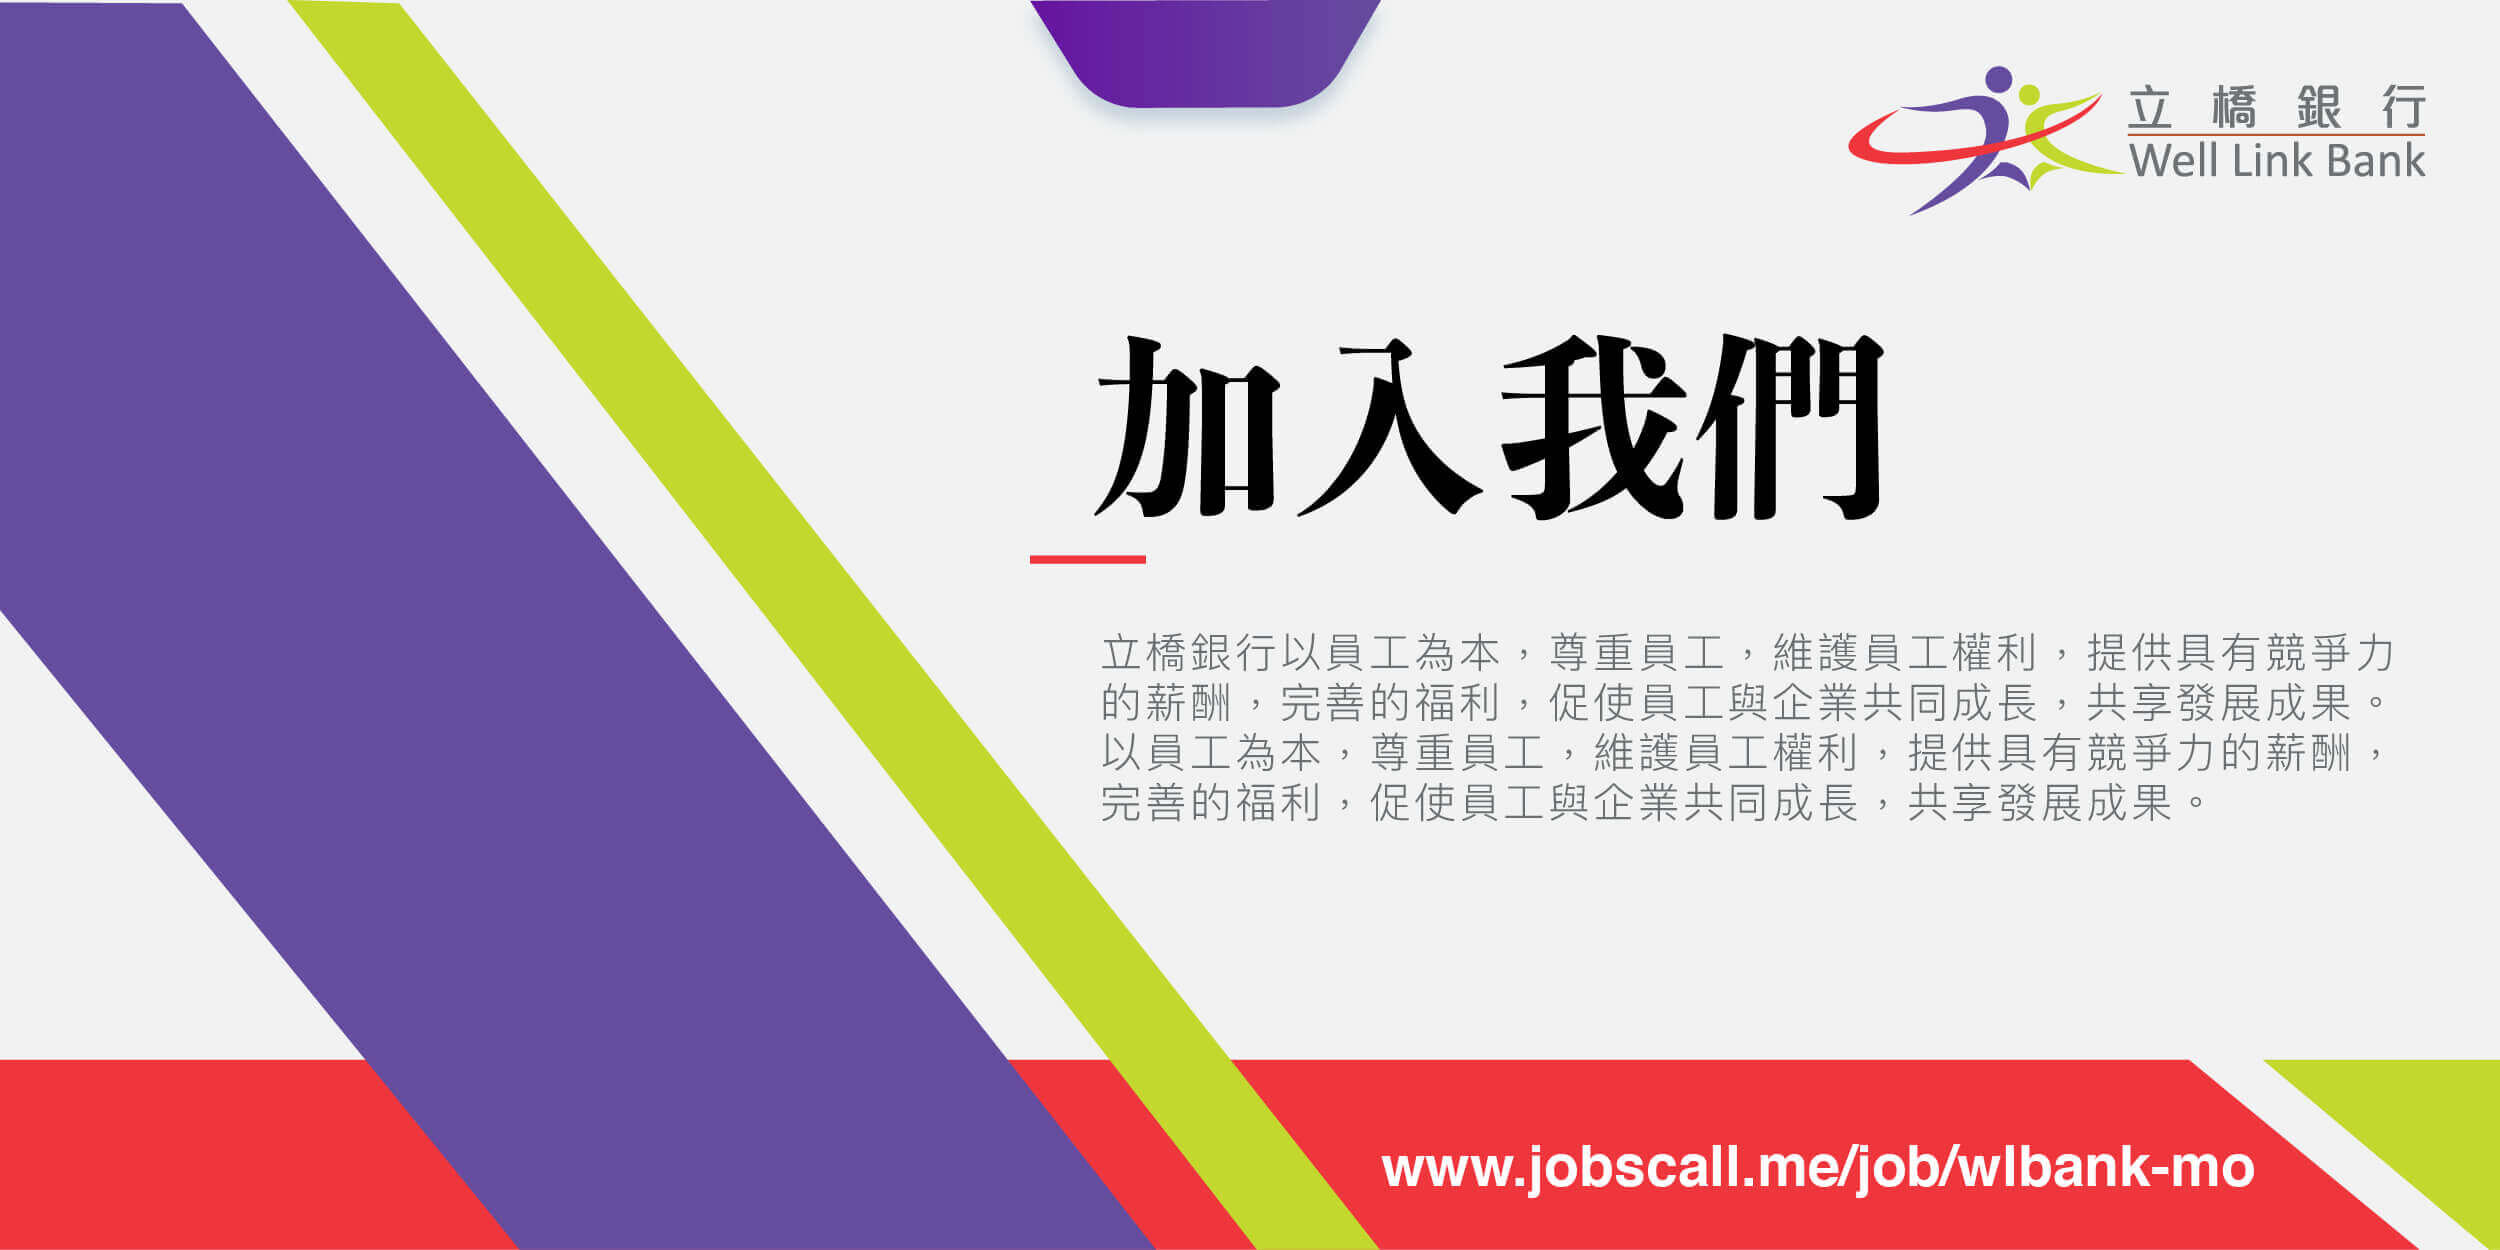 立僑銀行 Top Banner-01-2-2.jpg